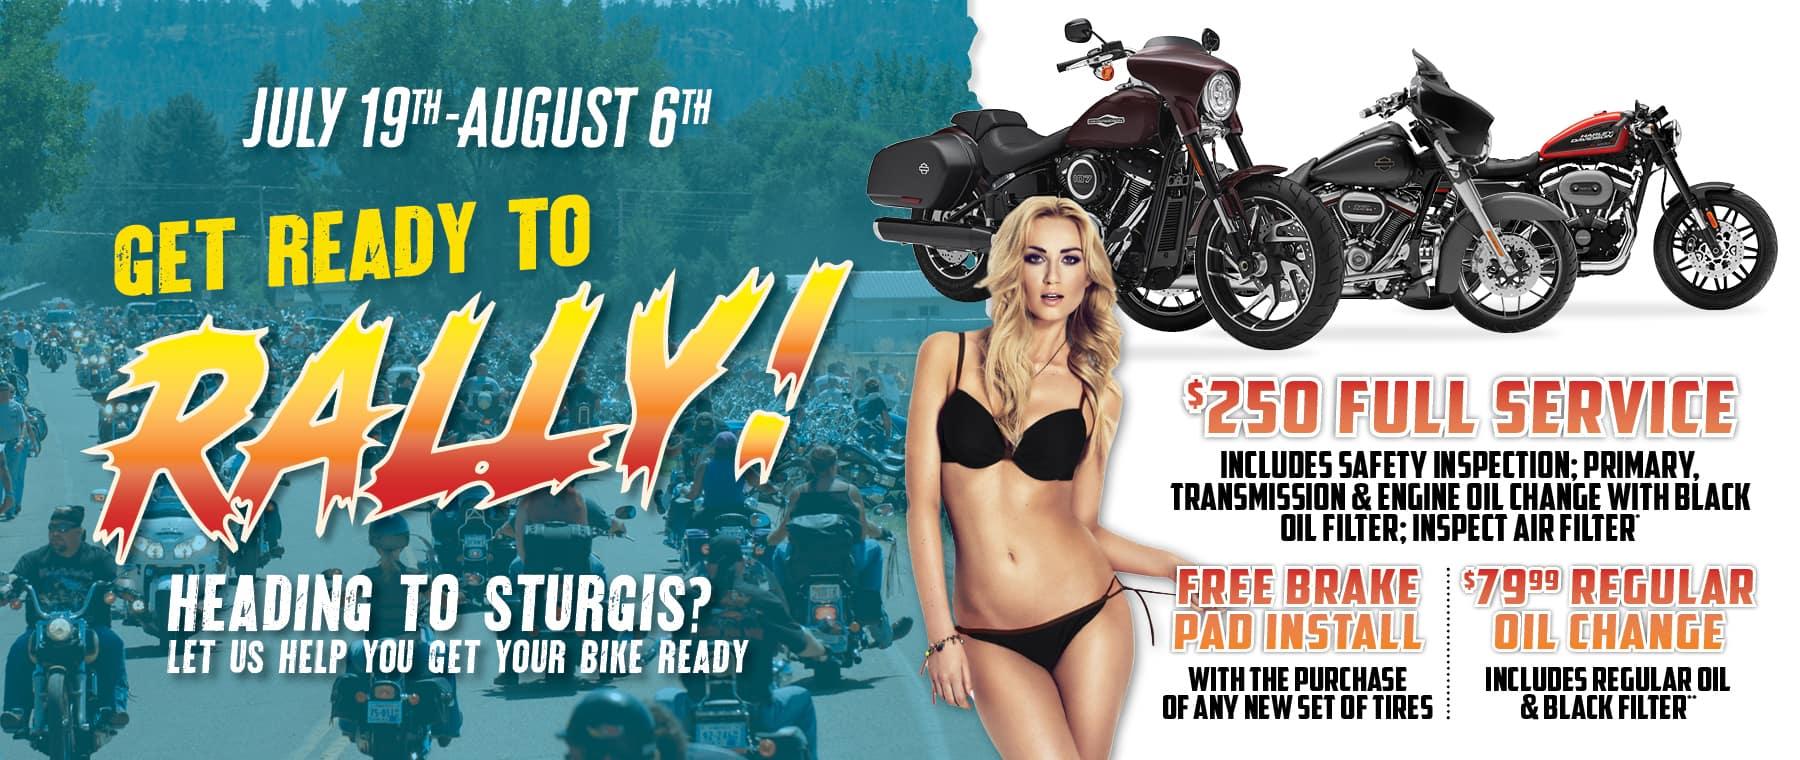 CA01_07_21_Ready_to_Rally_1800x760_WebBnr